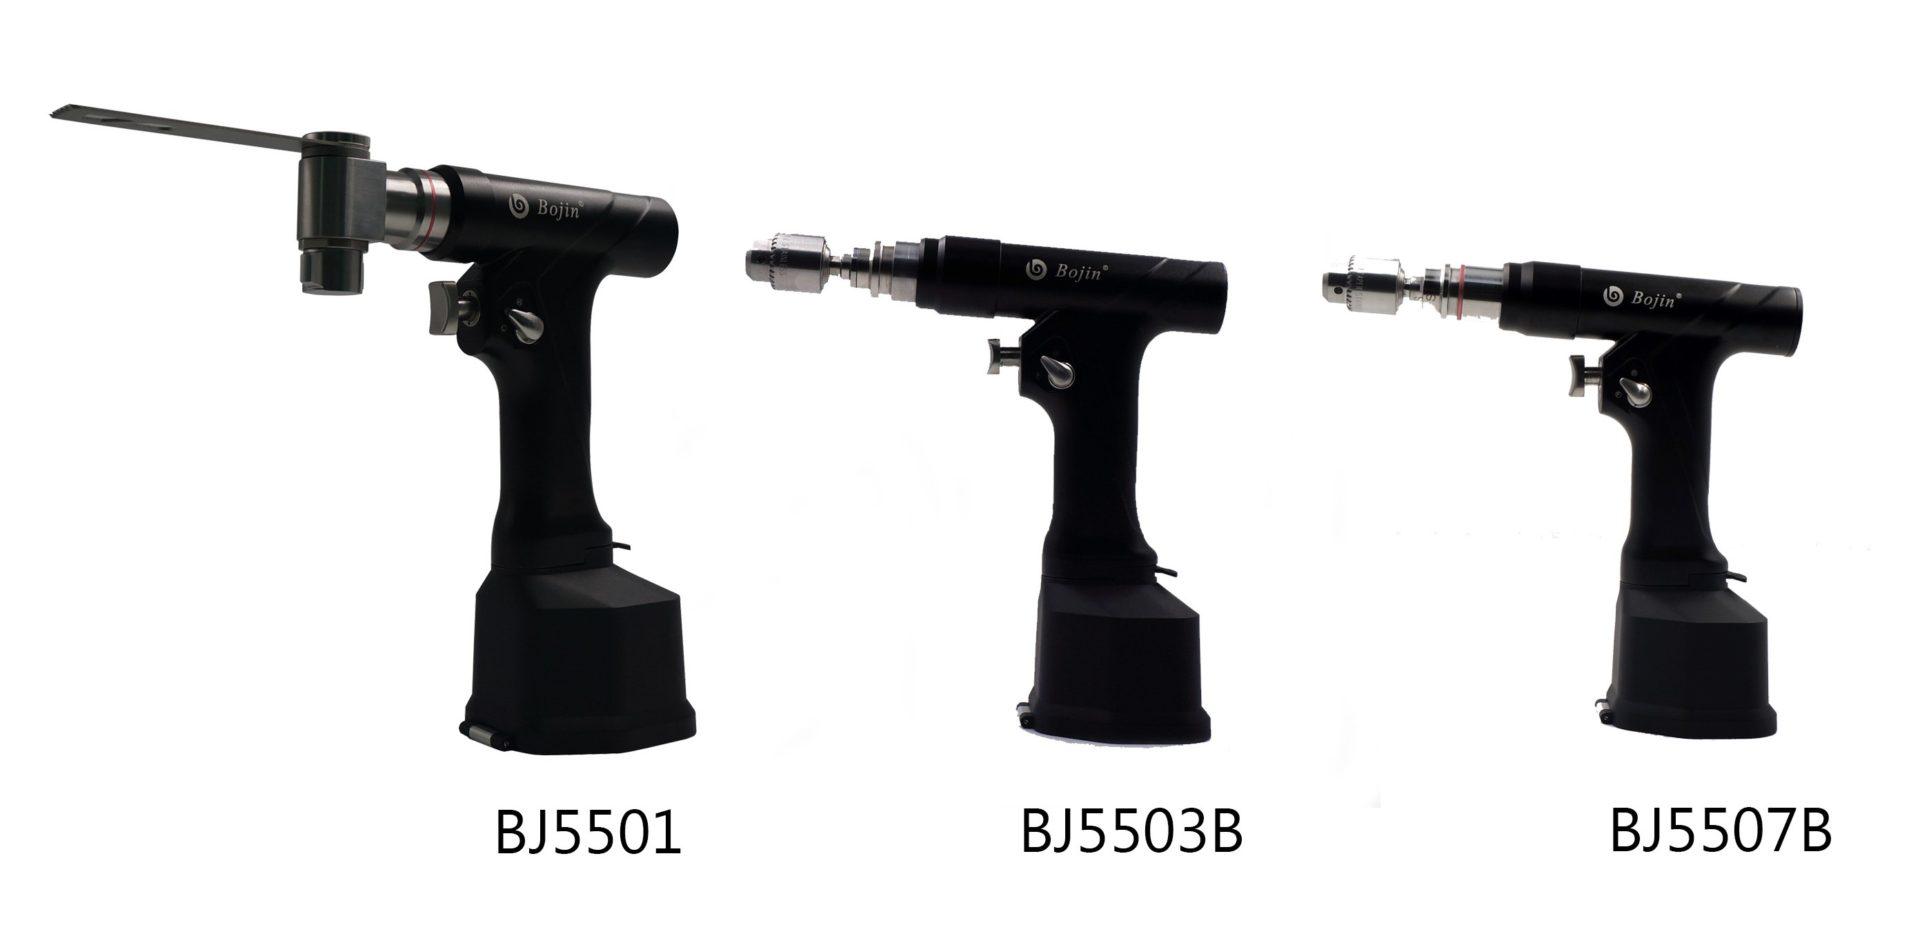 SYSTEM 5500 1 - SYSTEM 5500 (1)